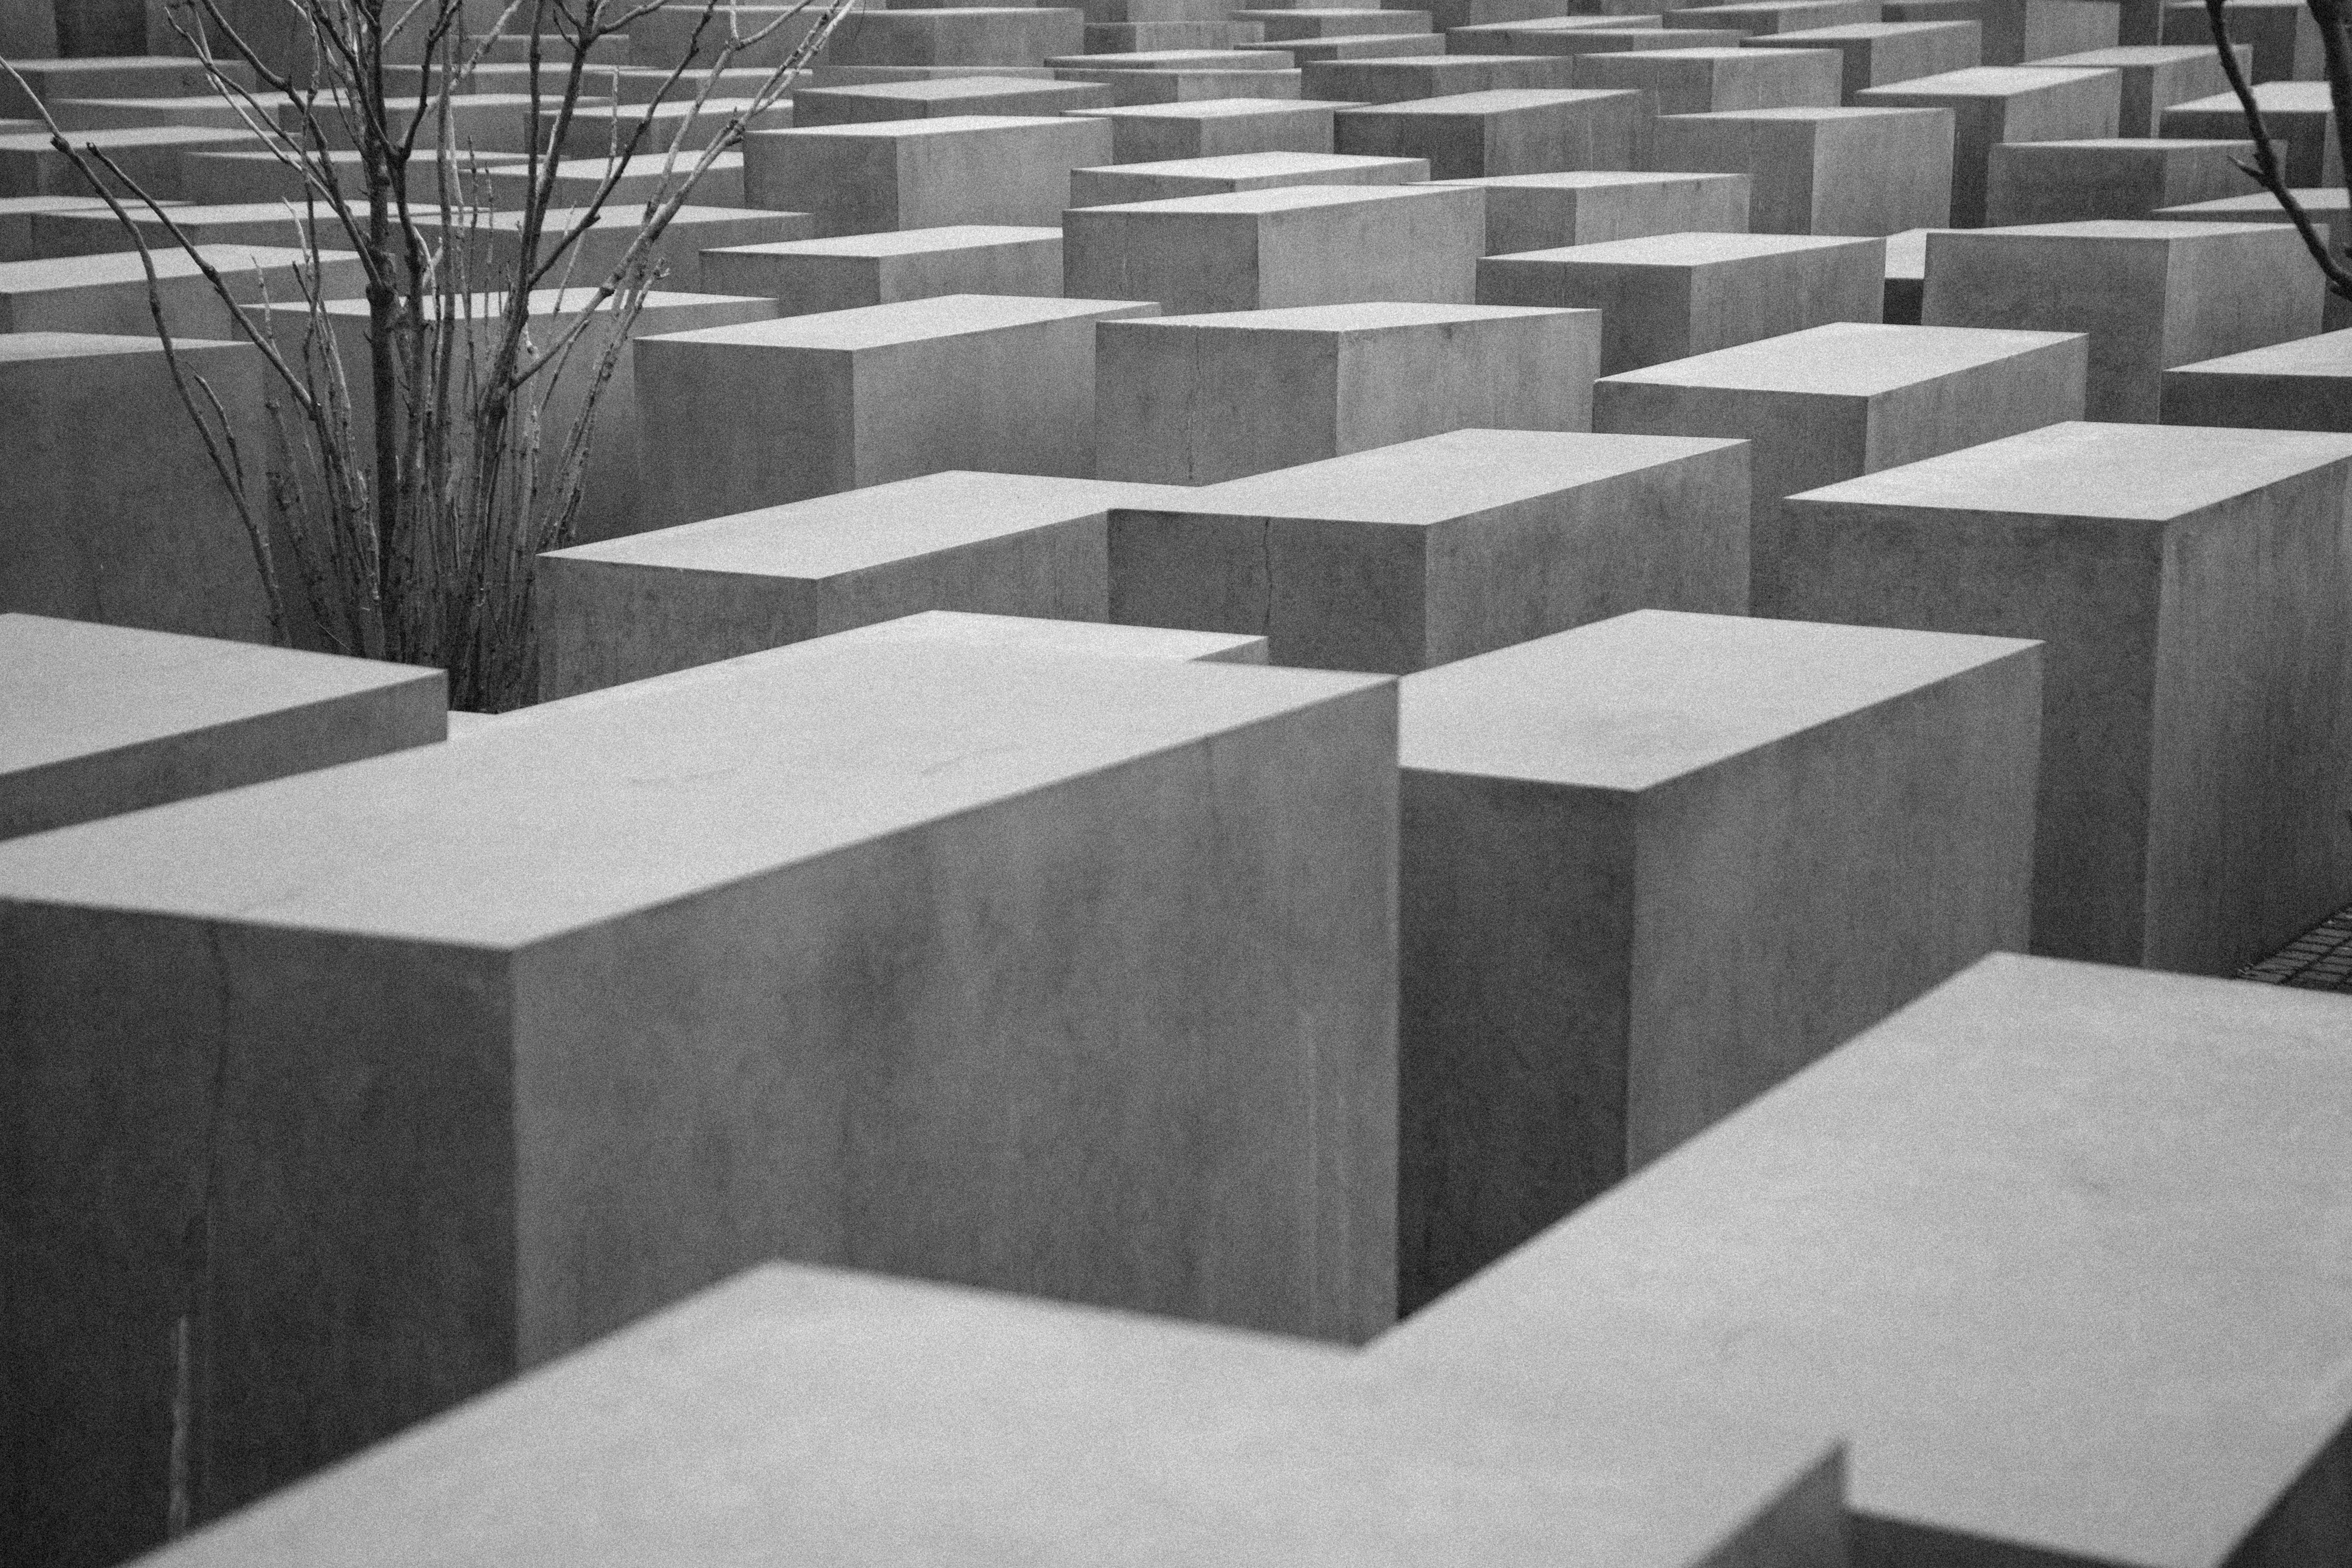 berlin-blocke-denkmal-fur-die-ermordeten